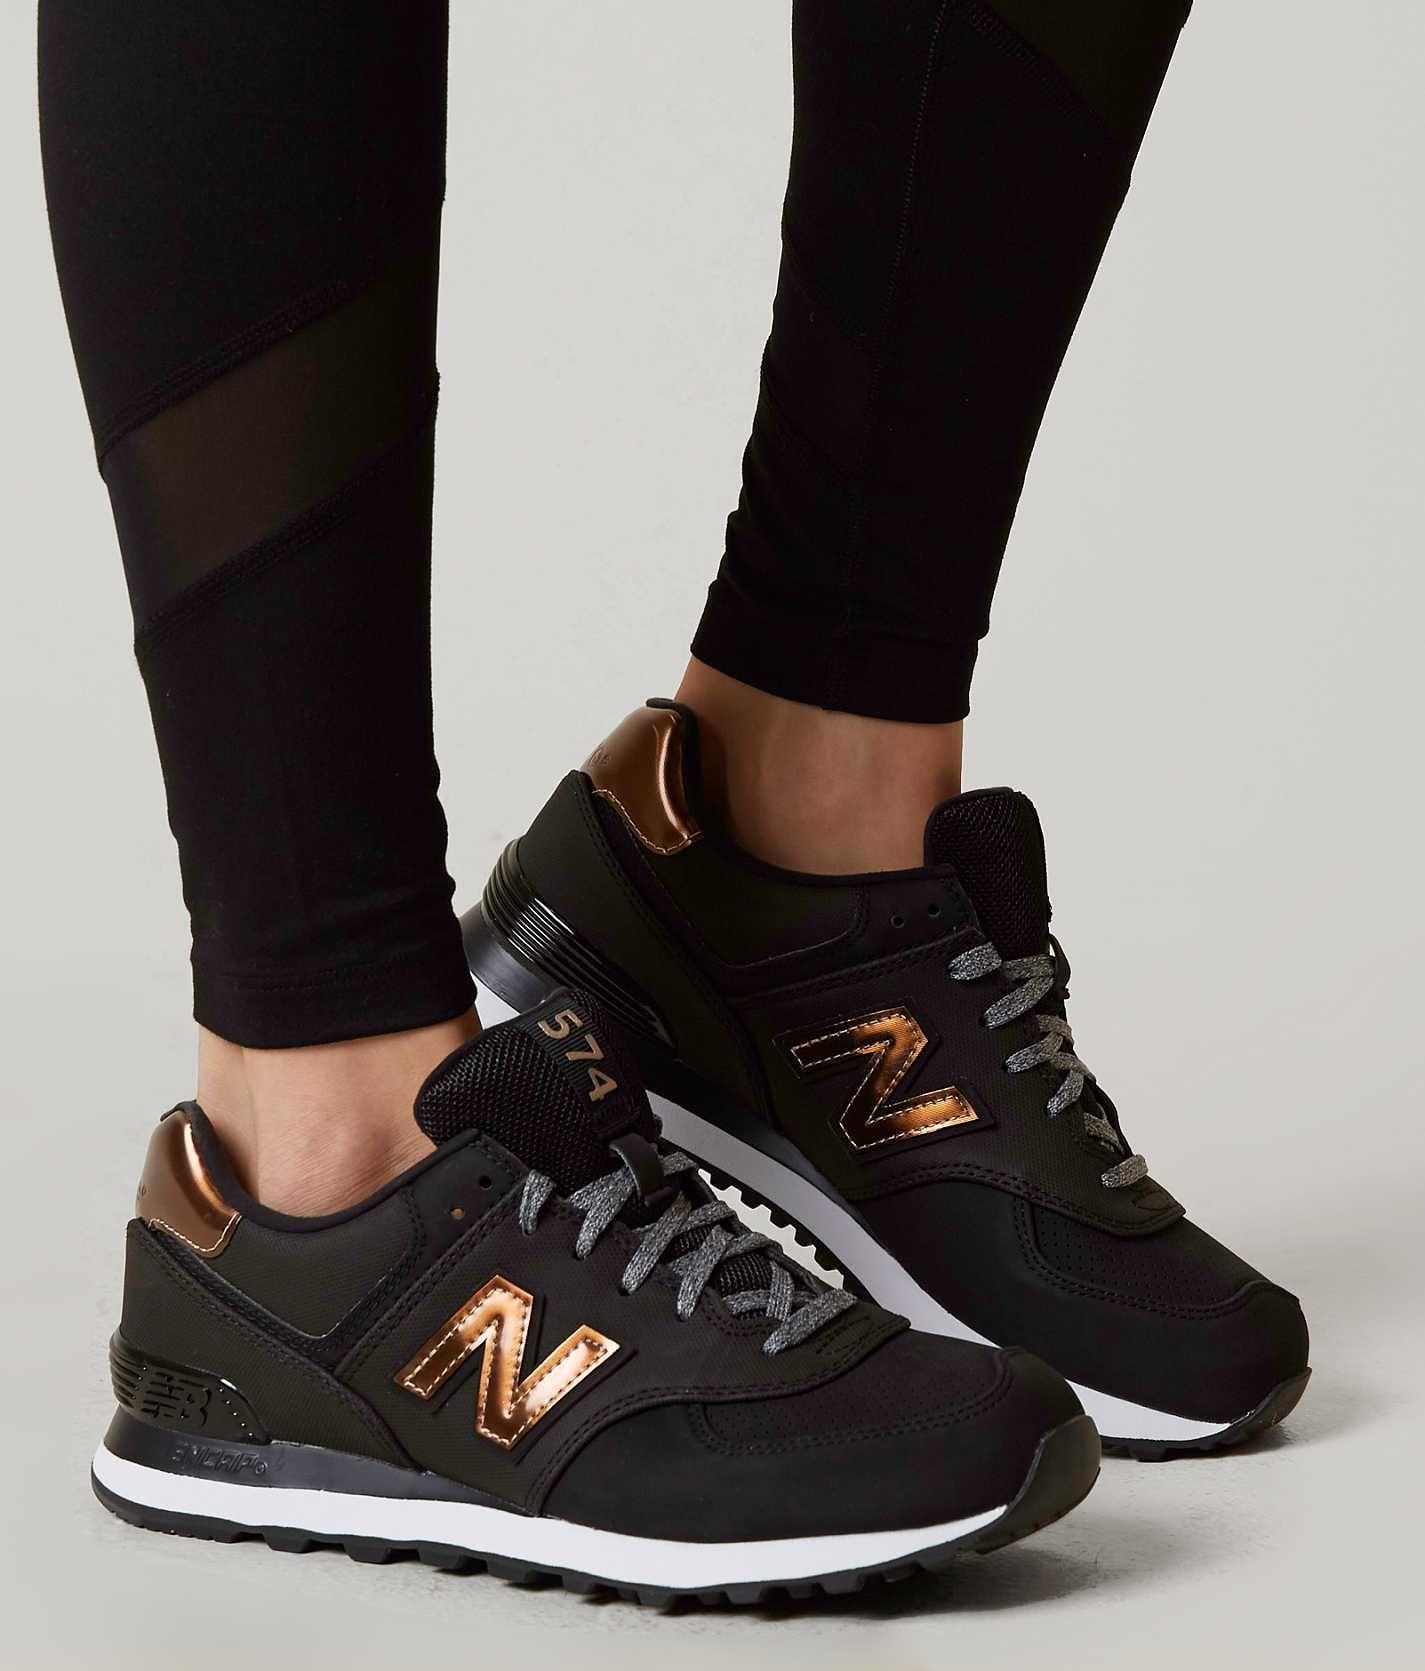 New Balance Varsity Sport Shoe Women S Shoes In Black Metallic Bronze Buckle Sport Shoes Women Sports Shoes Outfit Shoes Outfit Fashion